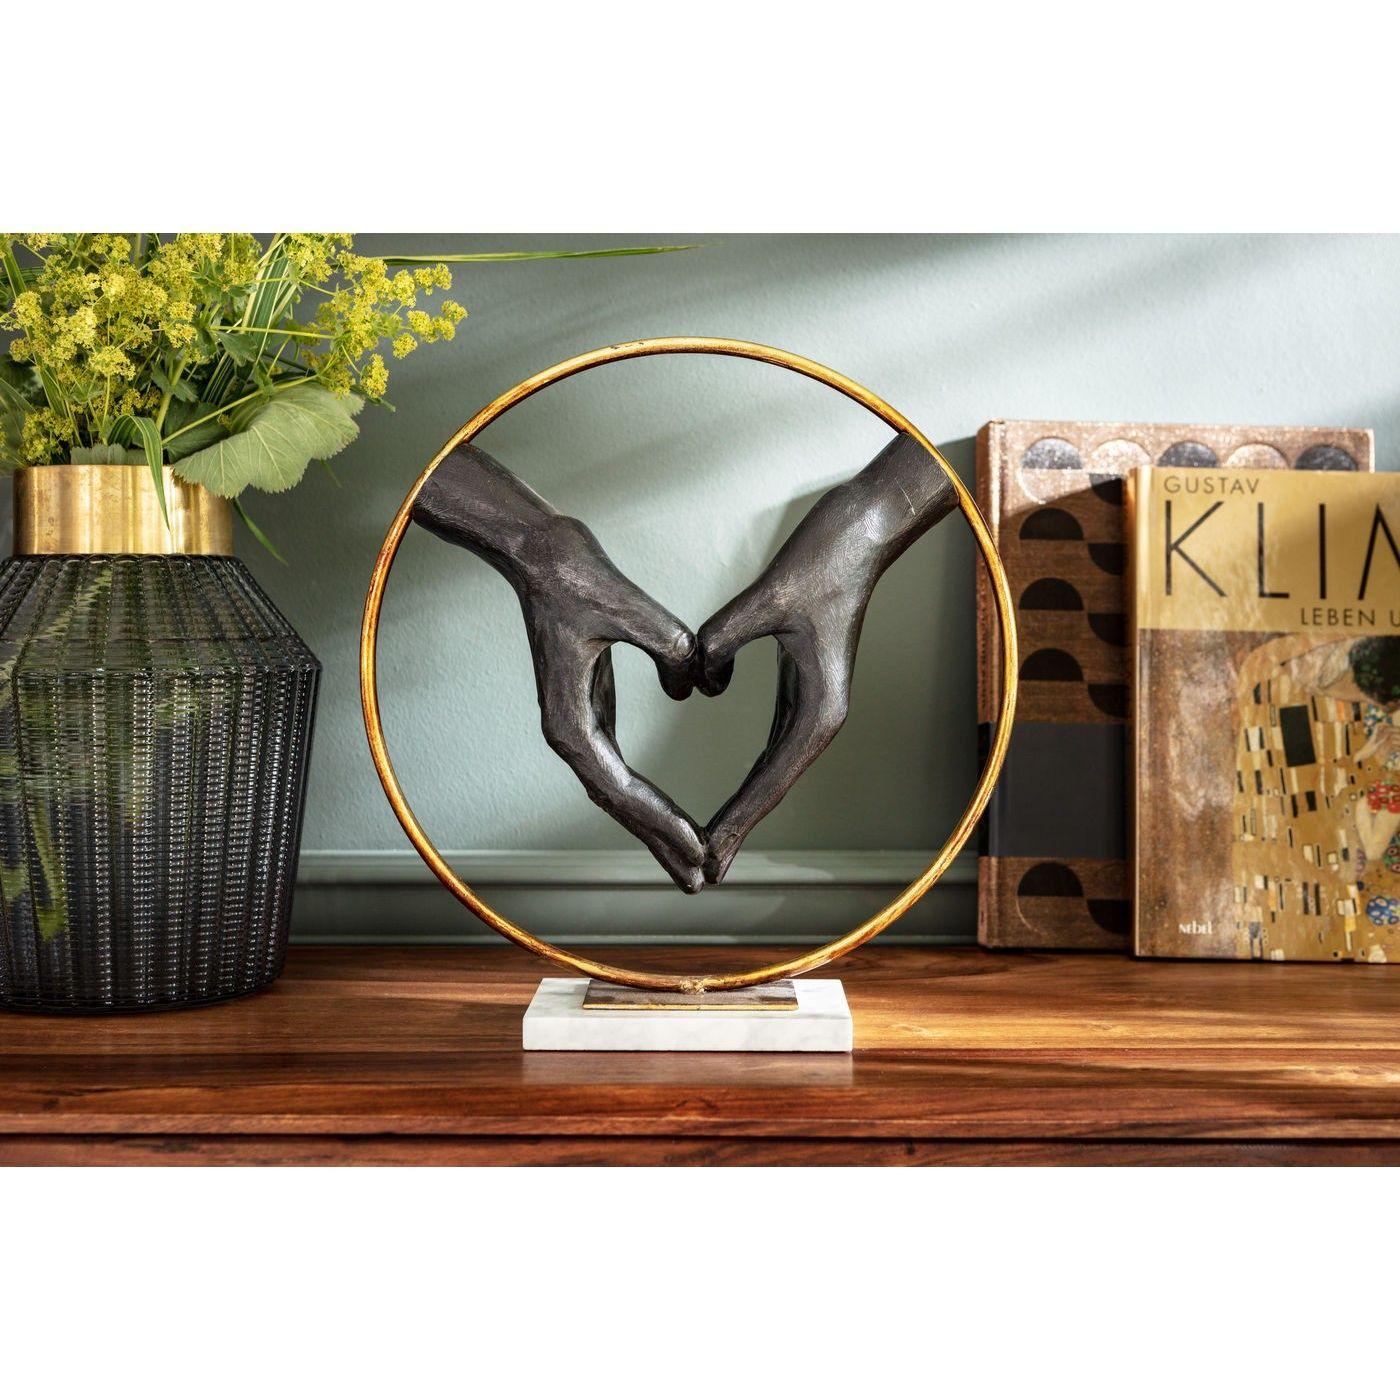 Deko Objekt Elements Heart Hand Accessoires Kare Design Kare